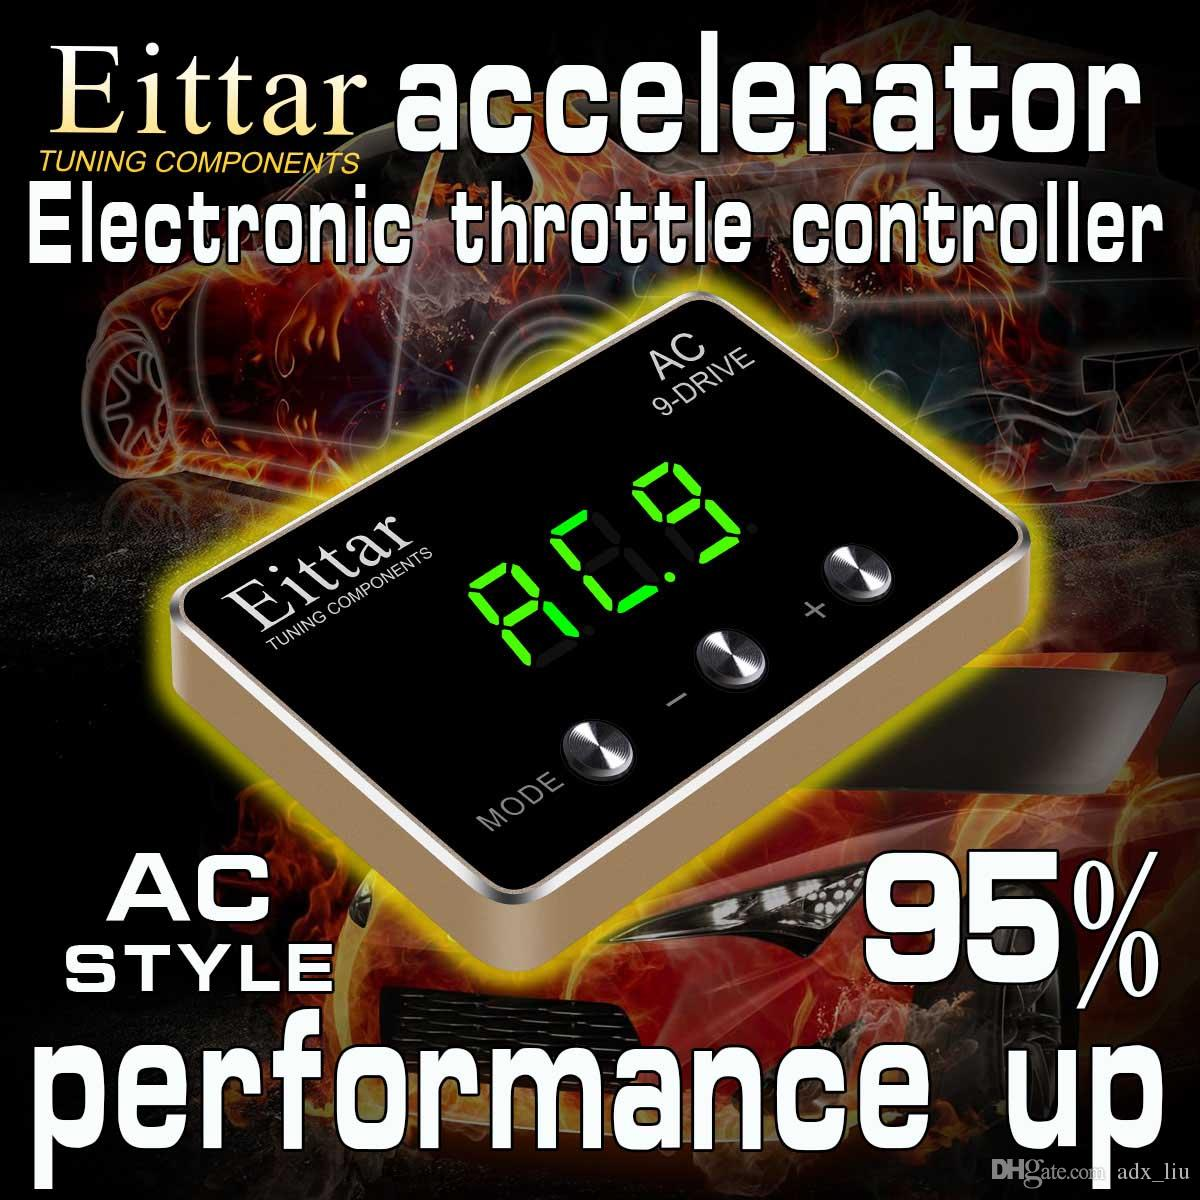 Eittar Electronic Throttle Controller Accelerator For Toyota Premio Old Allion 201410 Turbine Turbocharger Turbocharg From Adx Liu 8342